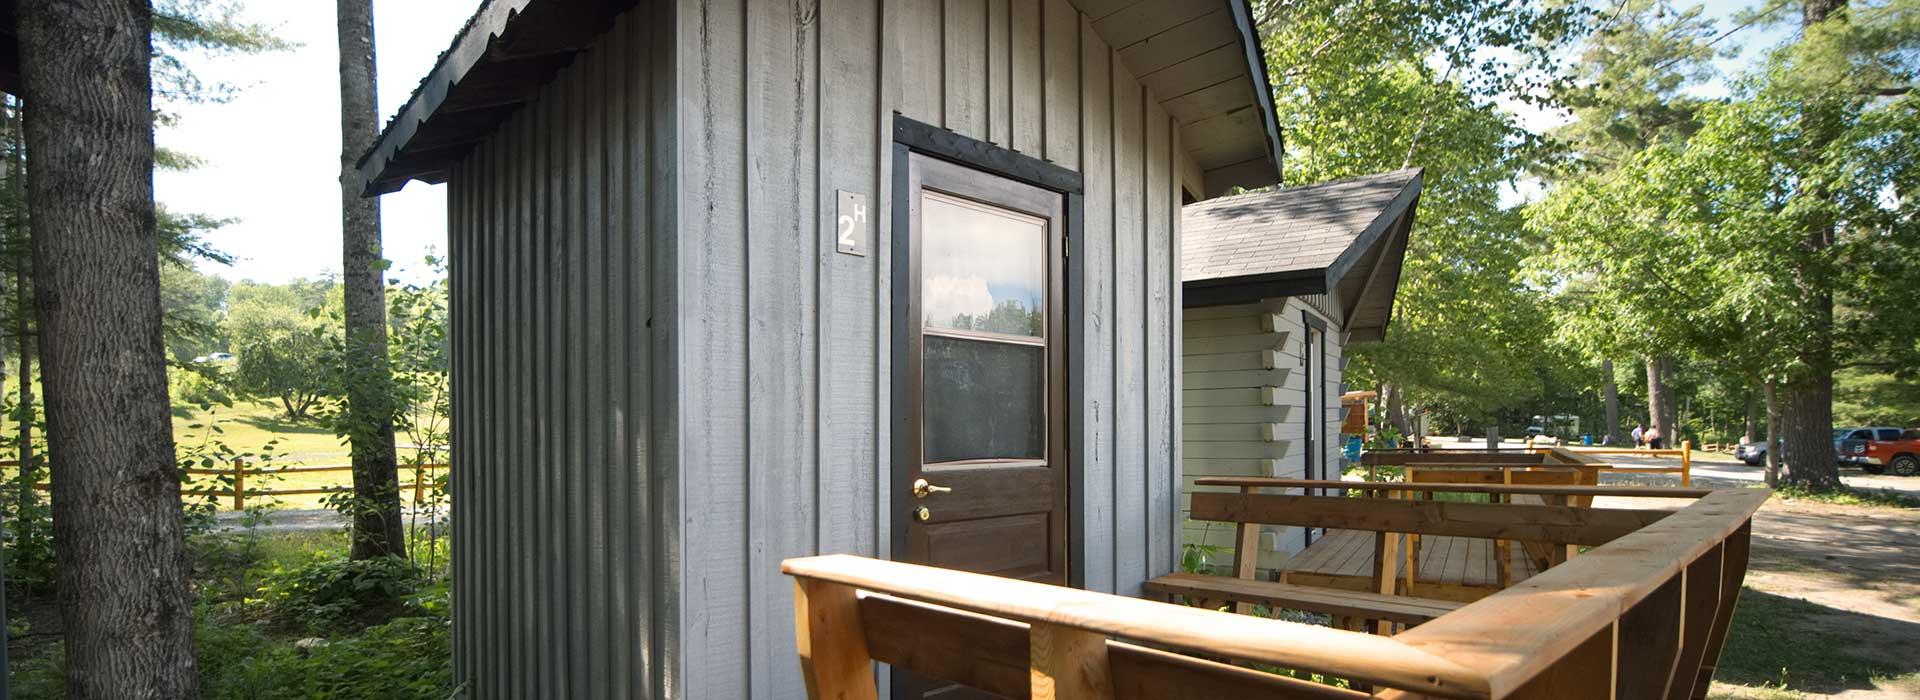 Hostel Cabin Mini